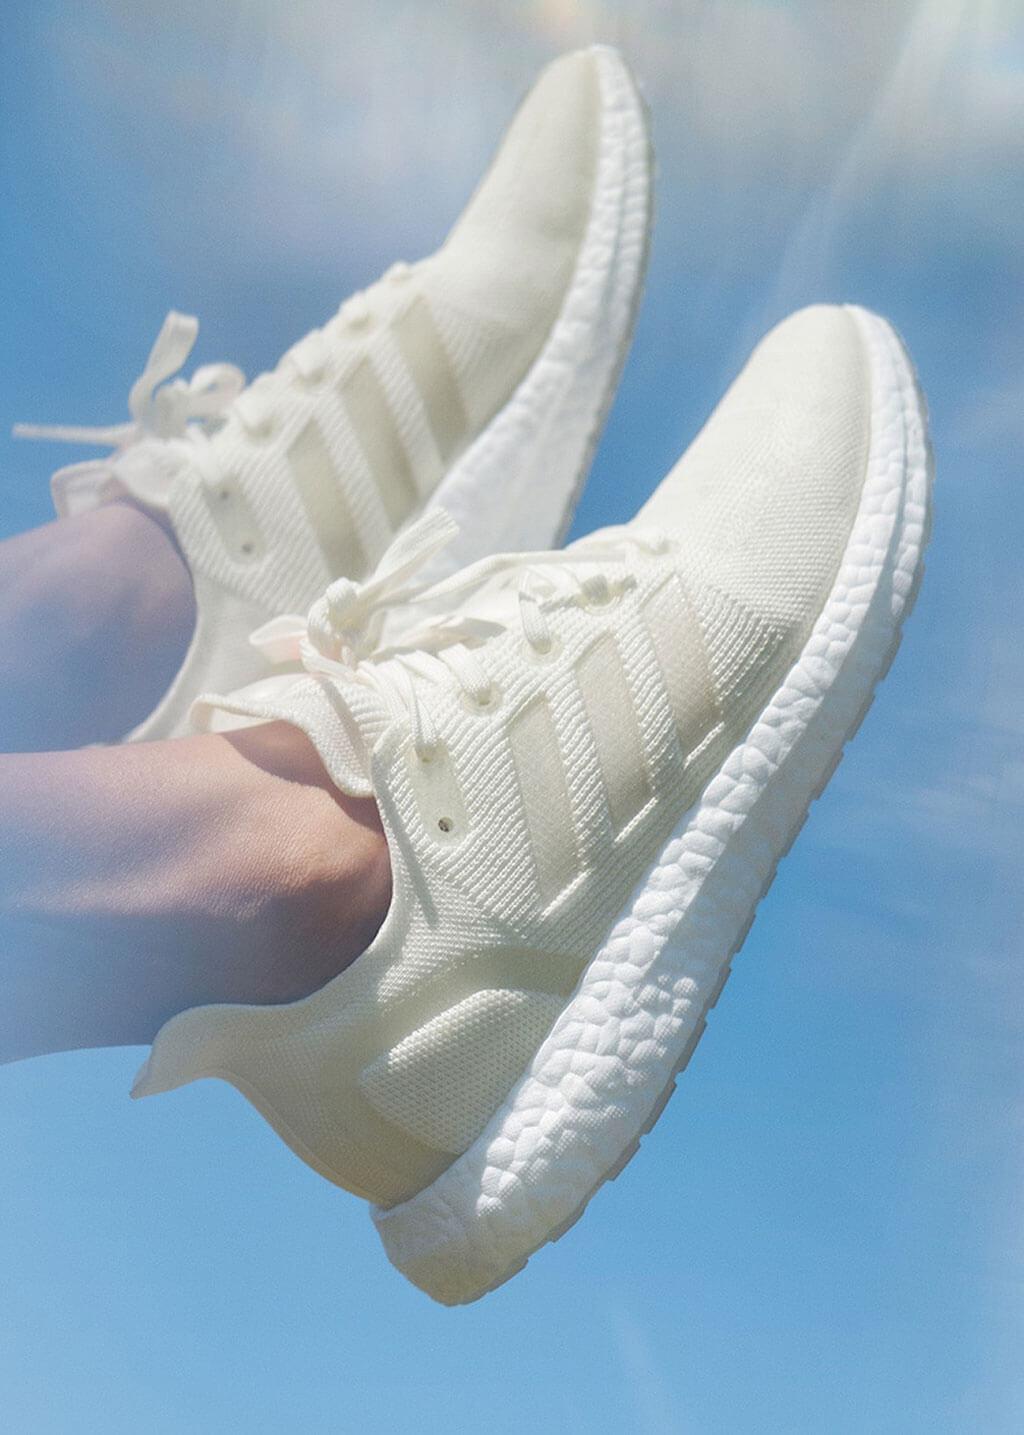 Adidas Futurecraft.Loop running shoe